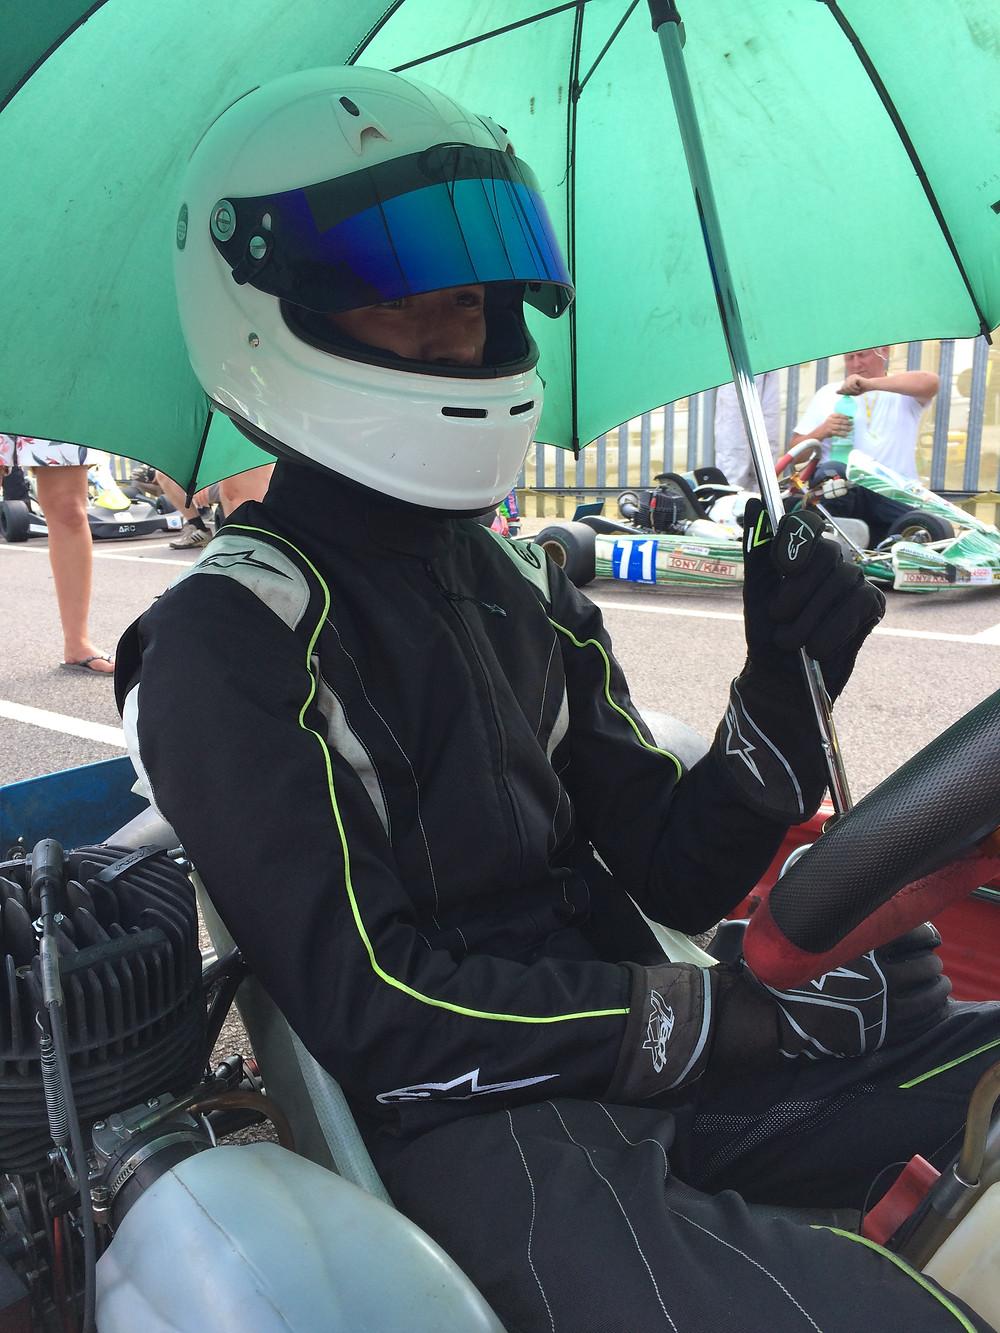 No grid girls in karting